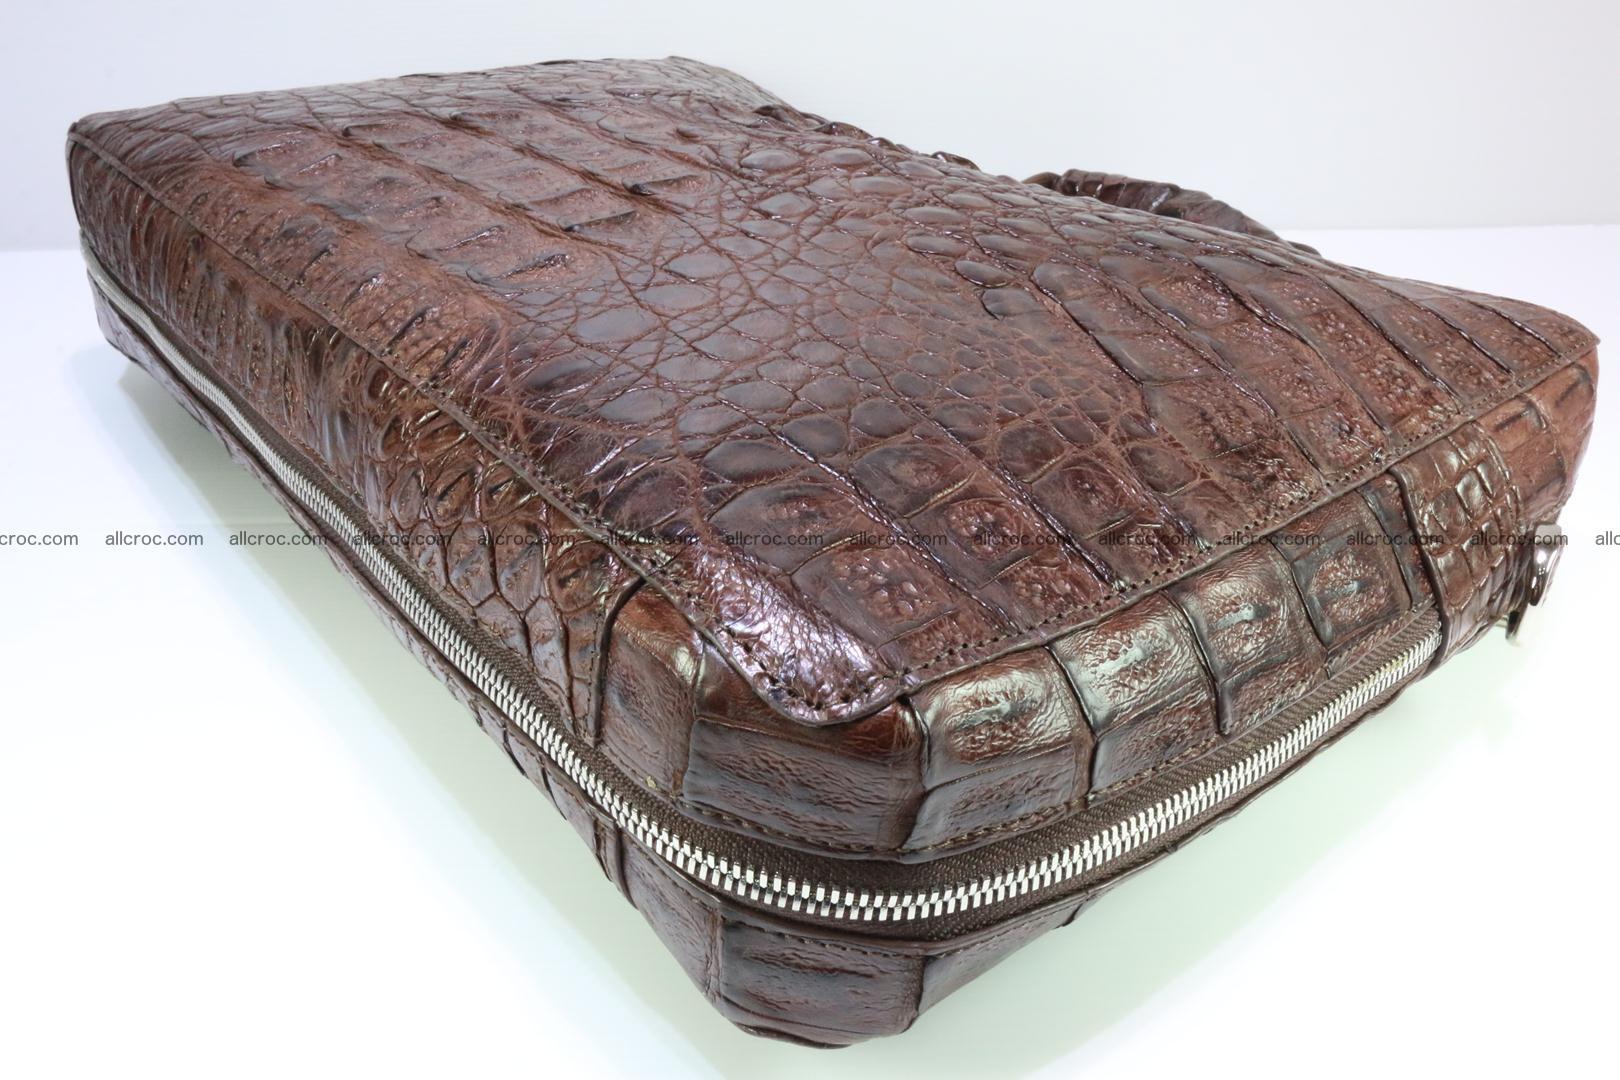 Crocodile skin handbag 126 Foto 11